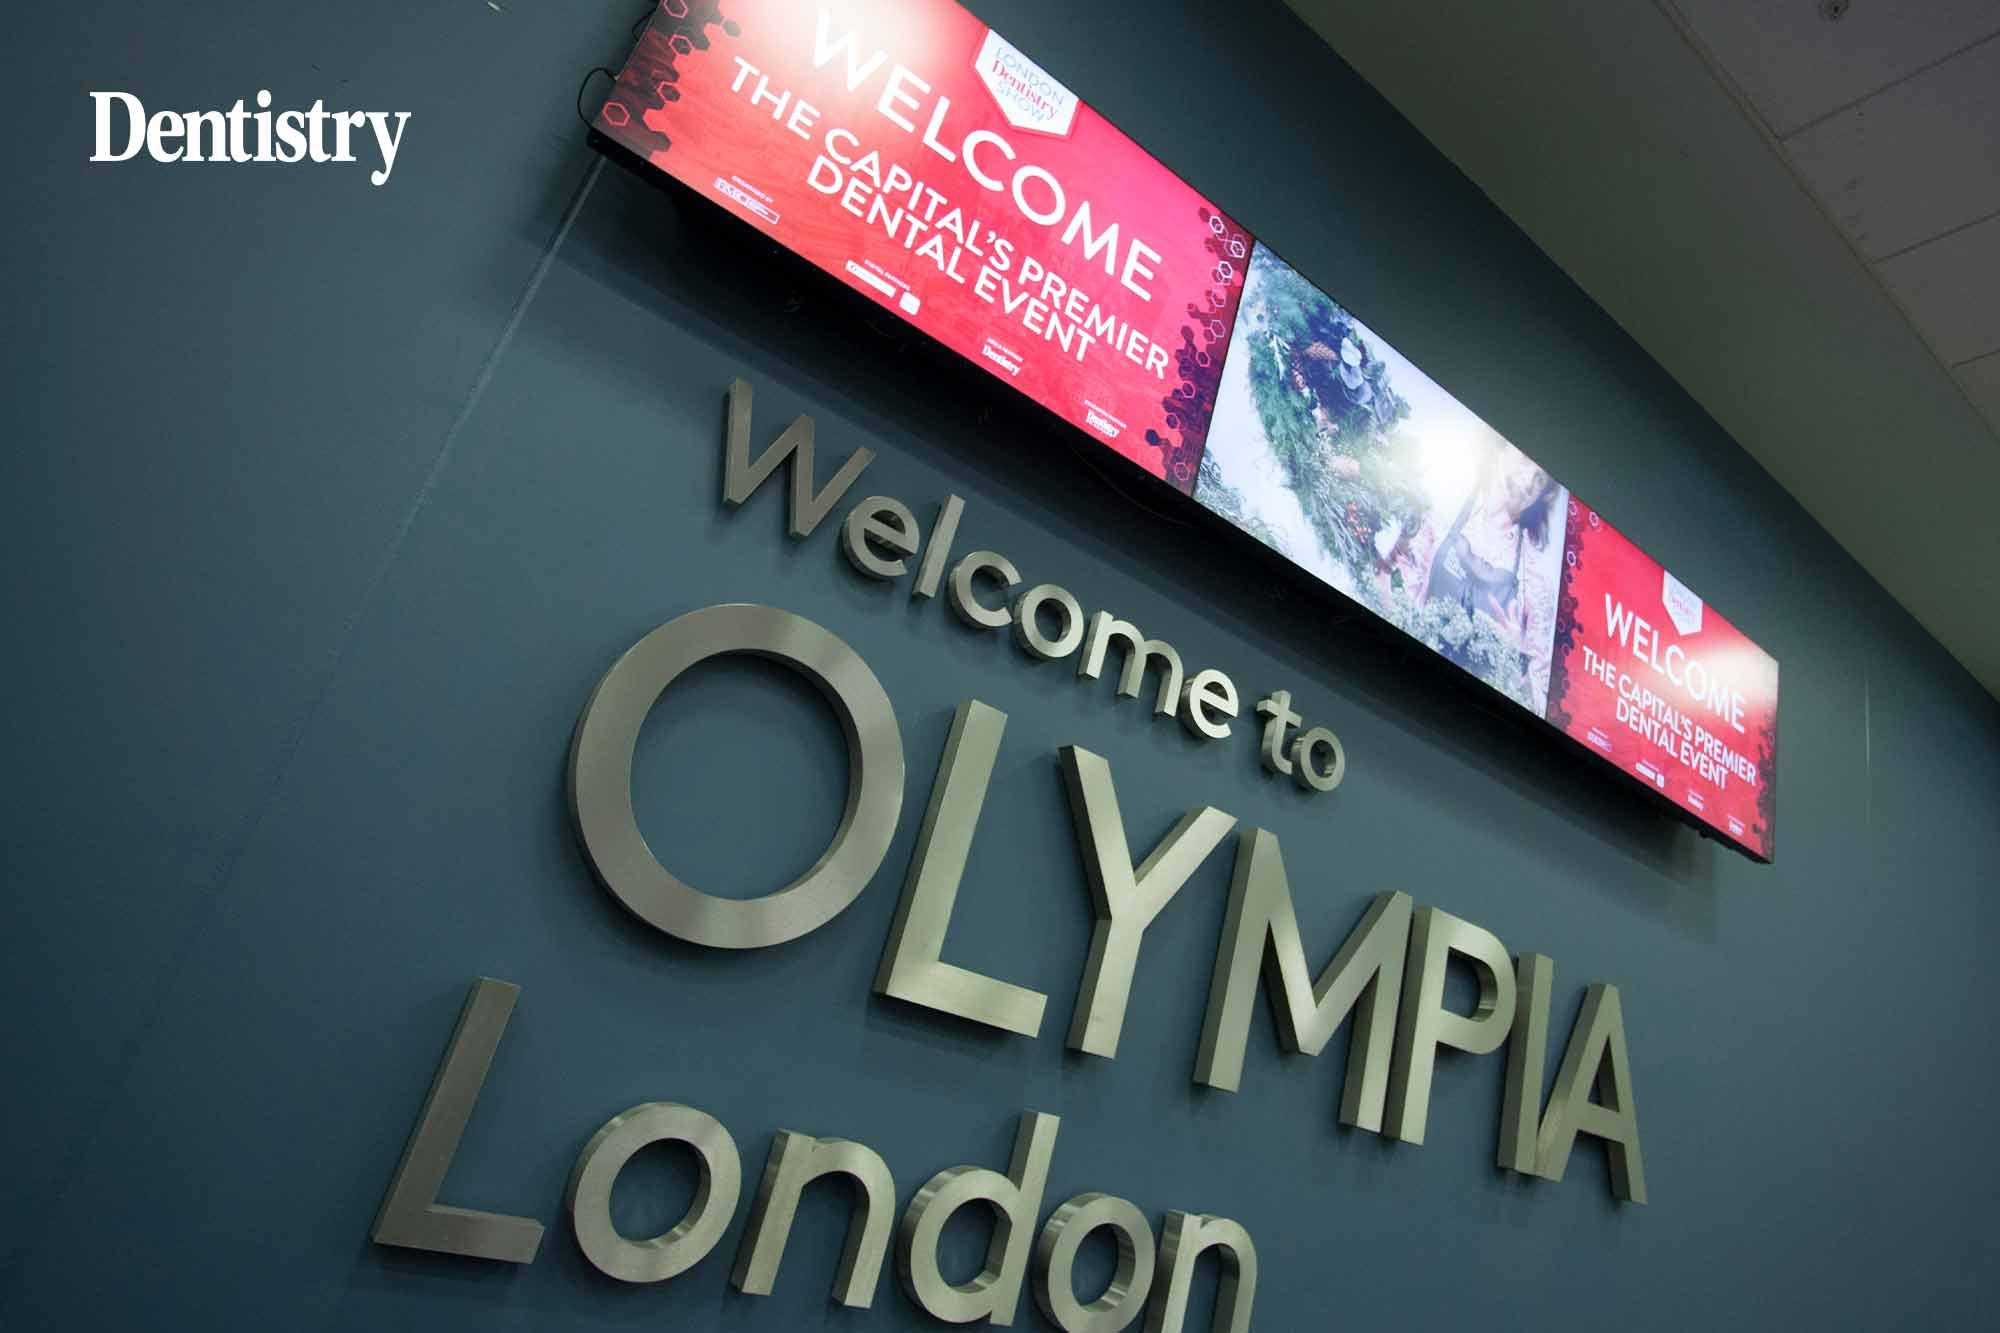 London dentistry show